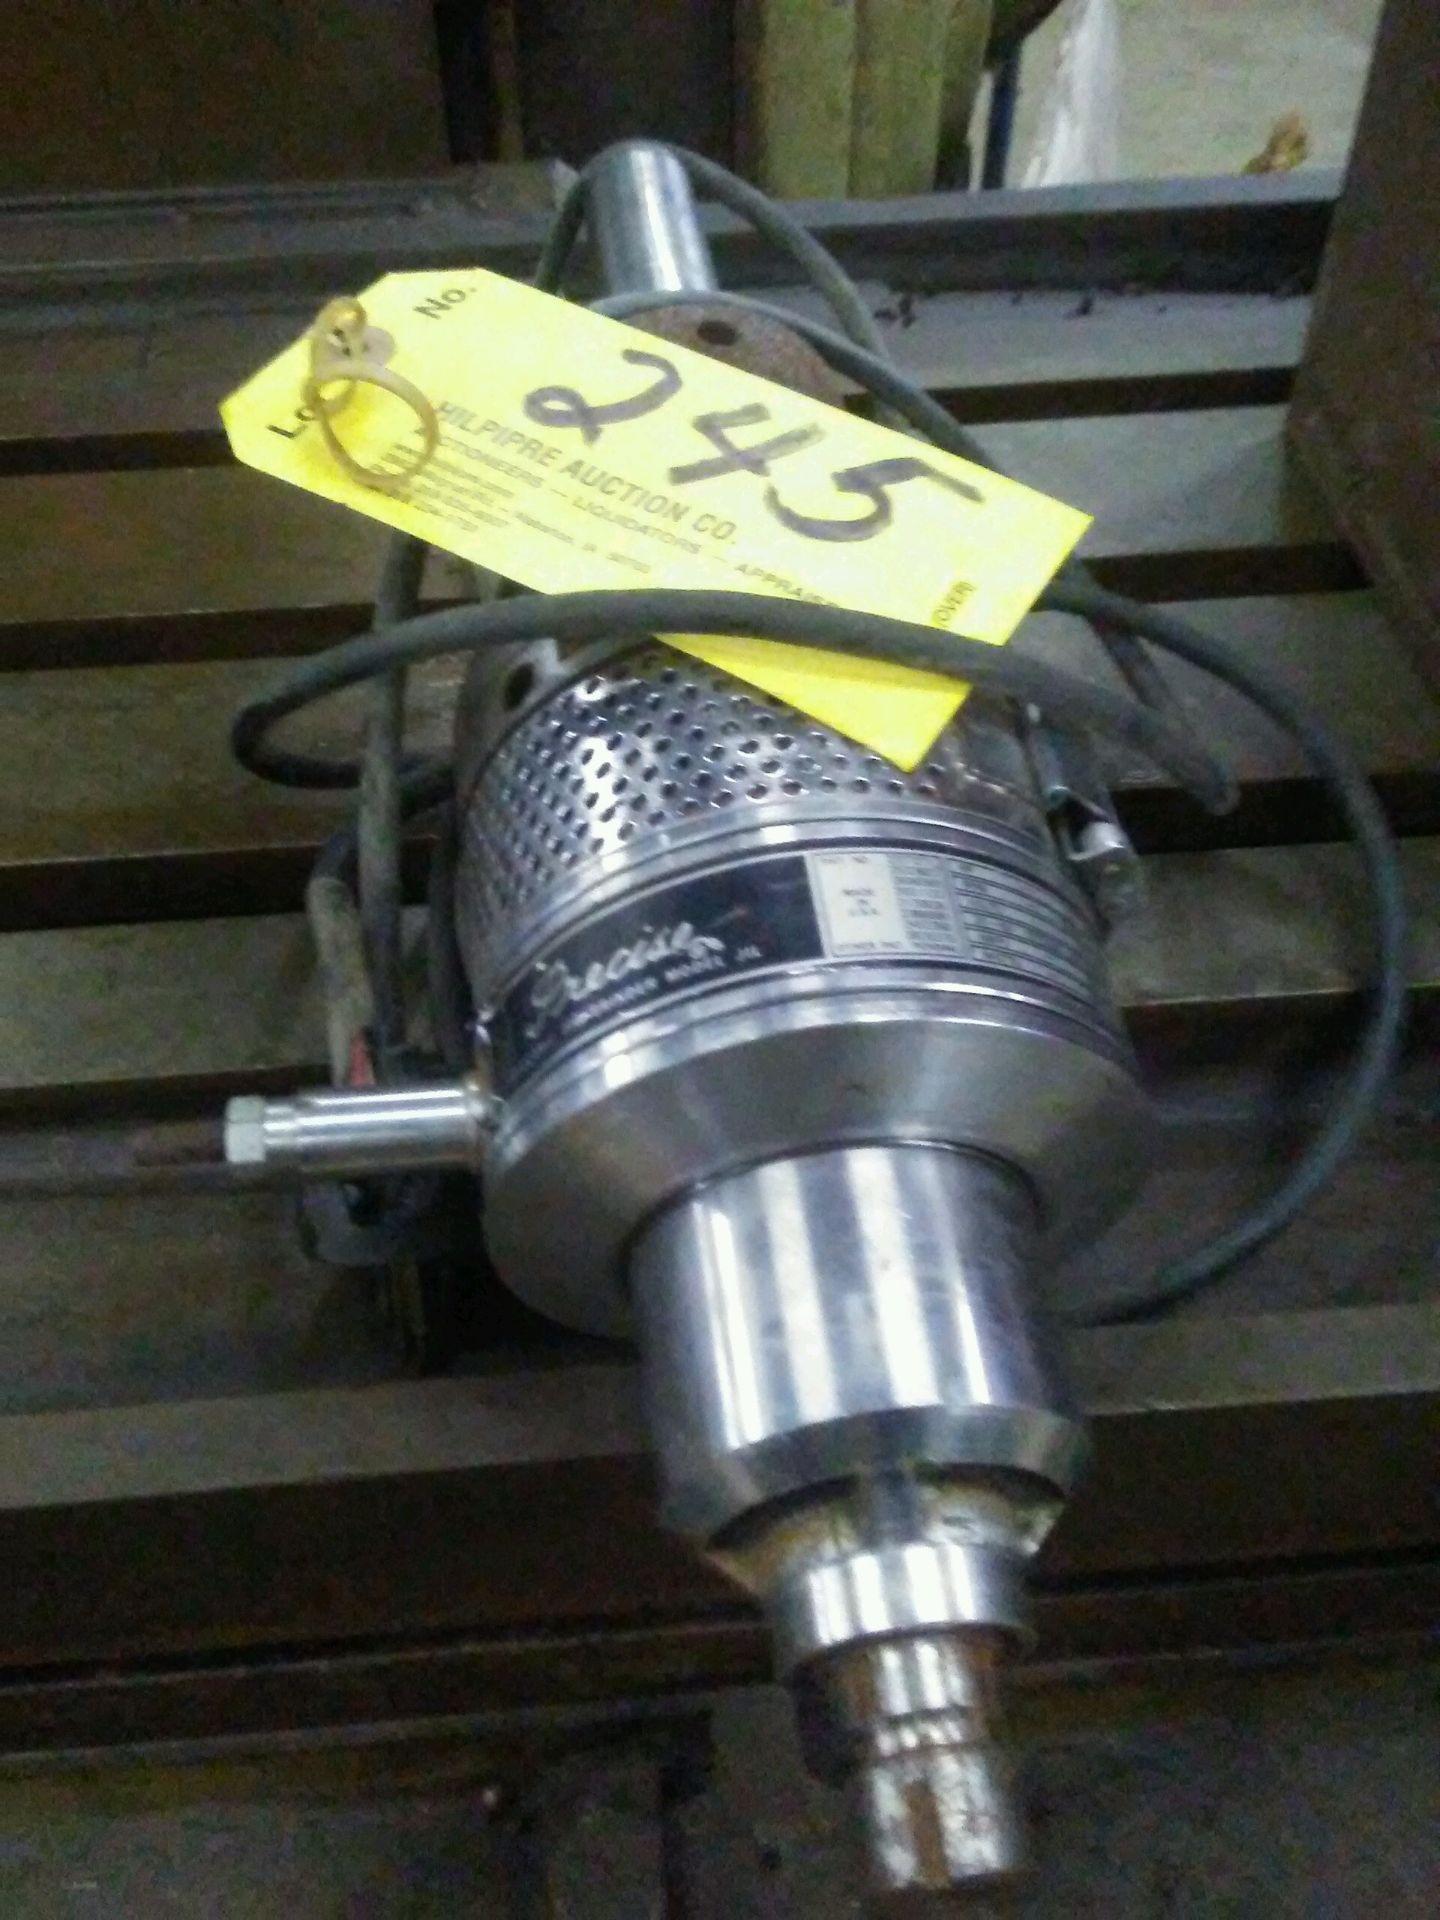 Precise electric jig grinder, model JIL.